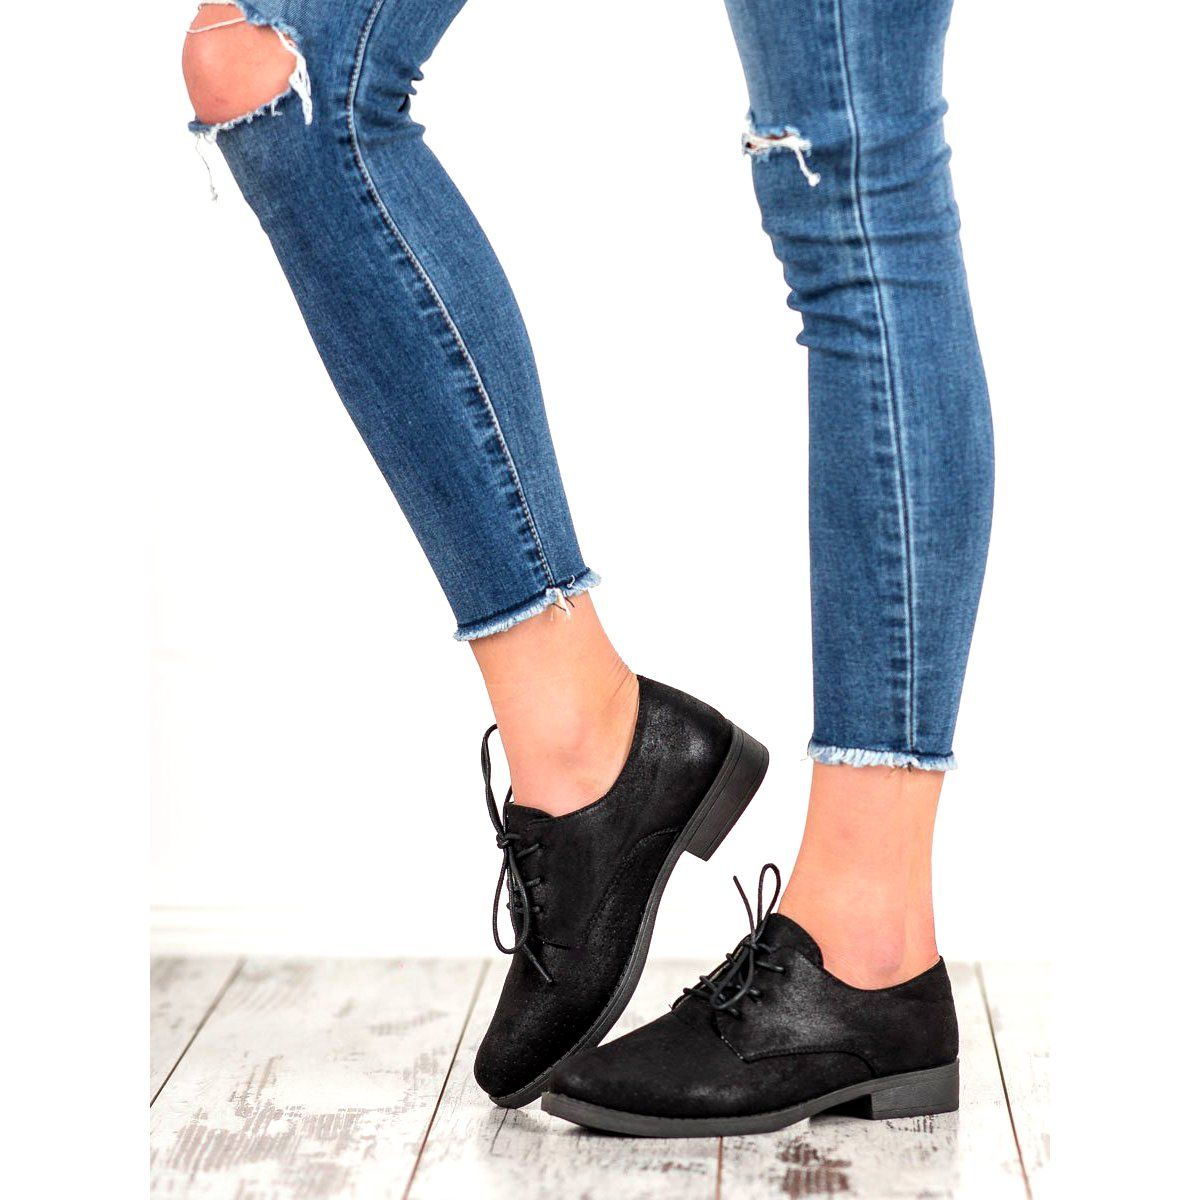 Bless Eleganckie Polbuty Damskie Czarne Oxford Shoes Womens Oxfords Shoes